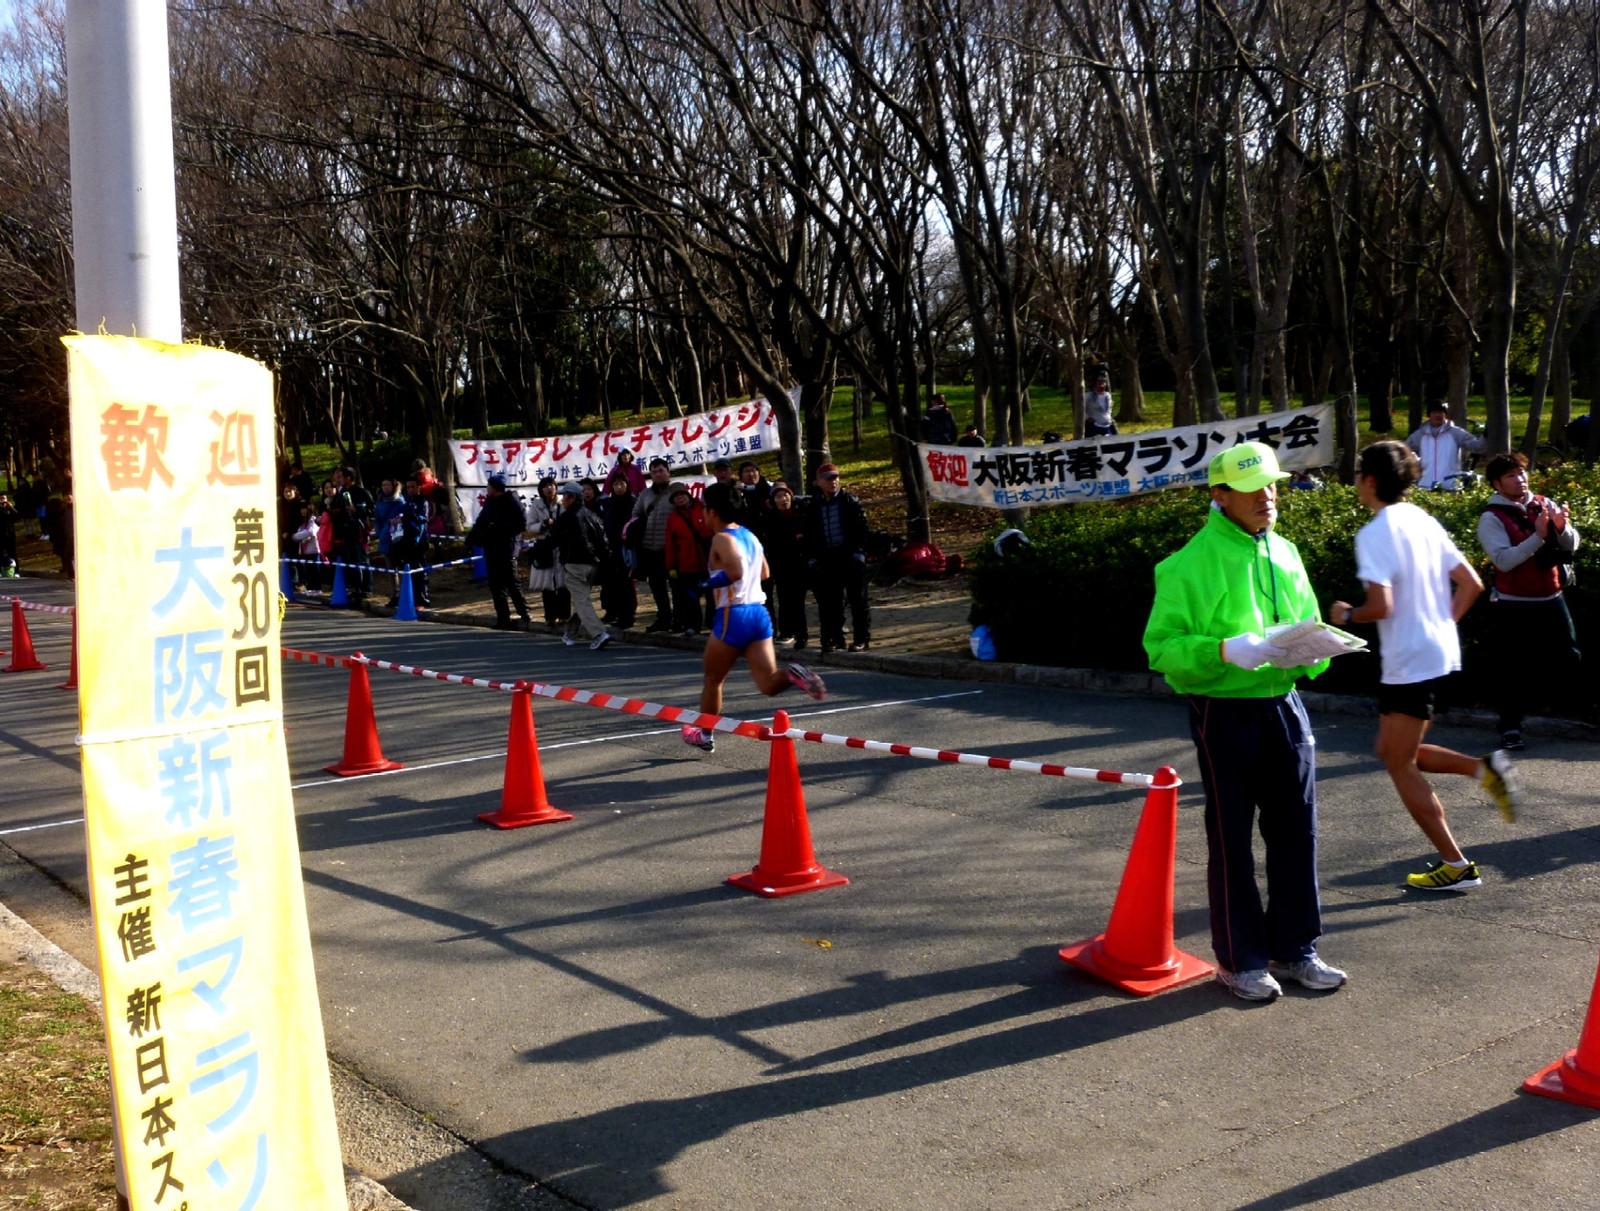 Shinsyunmarathon2014_5